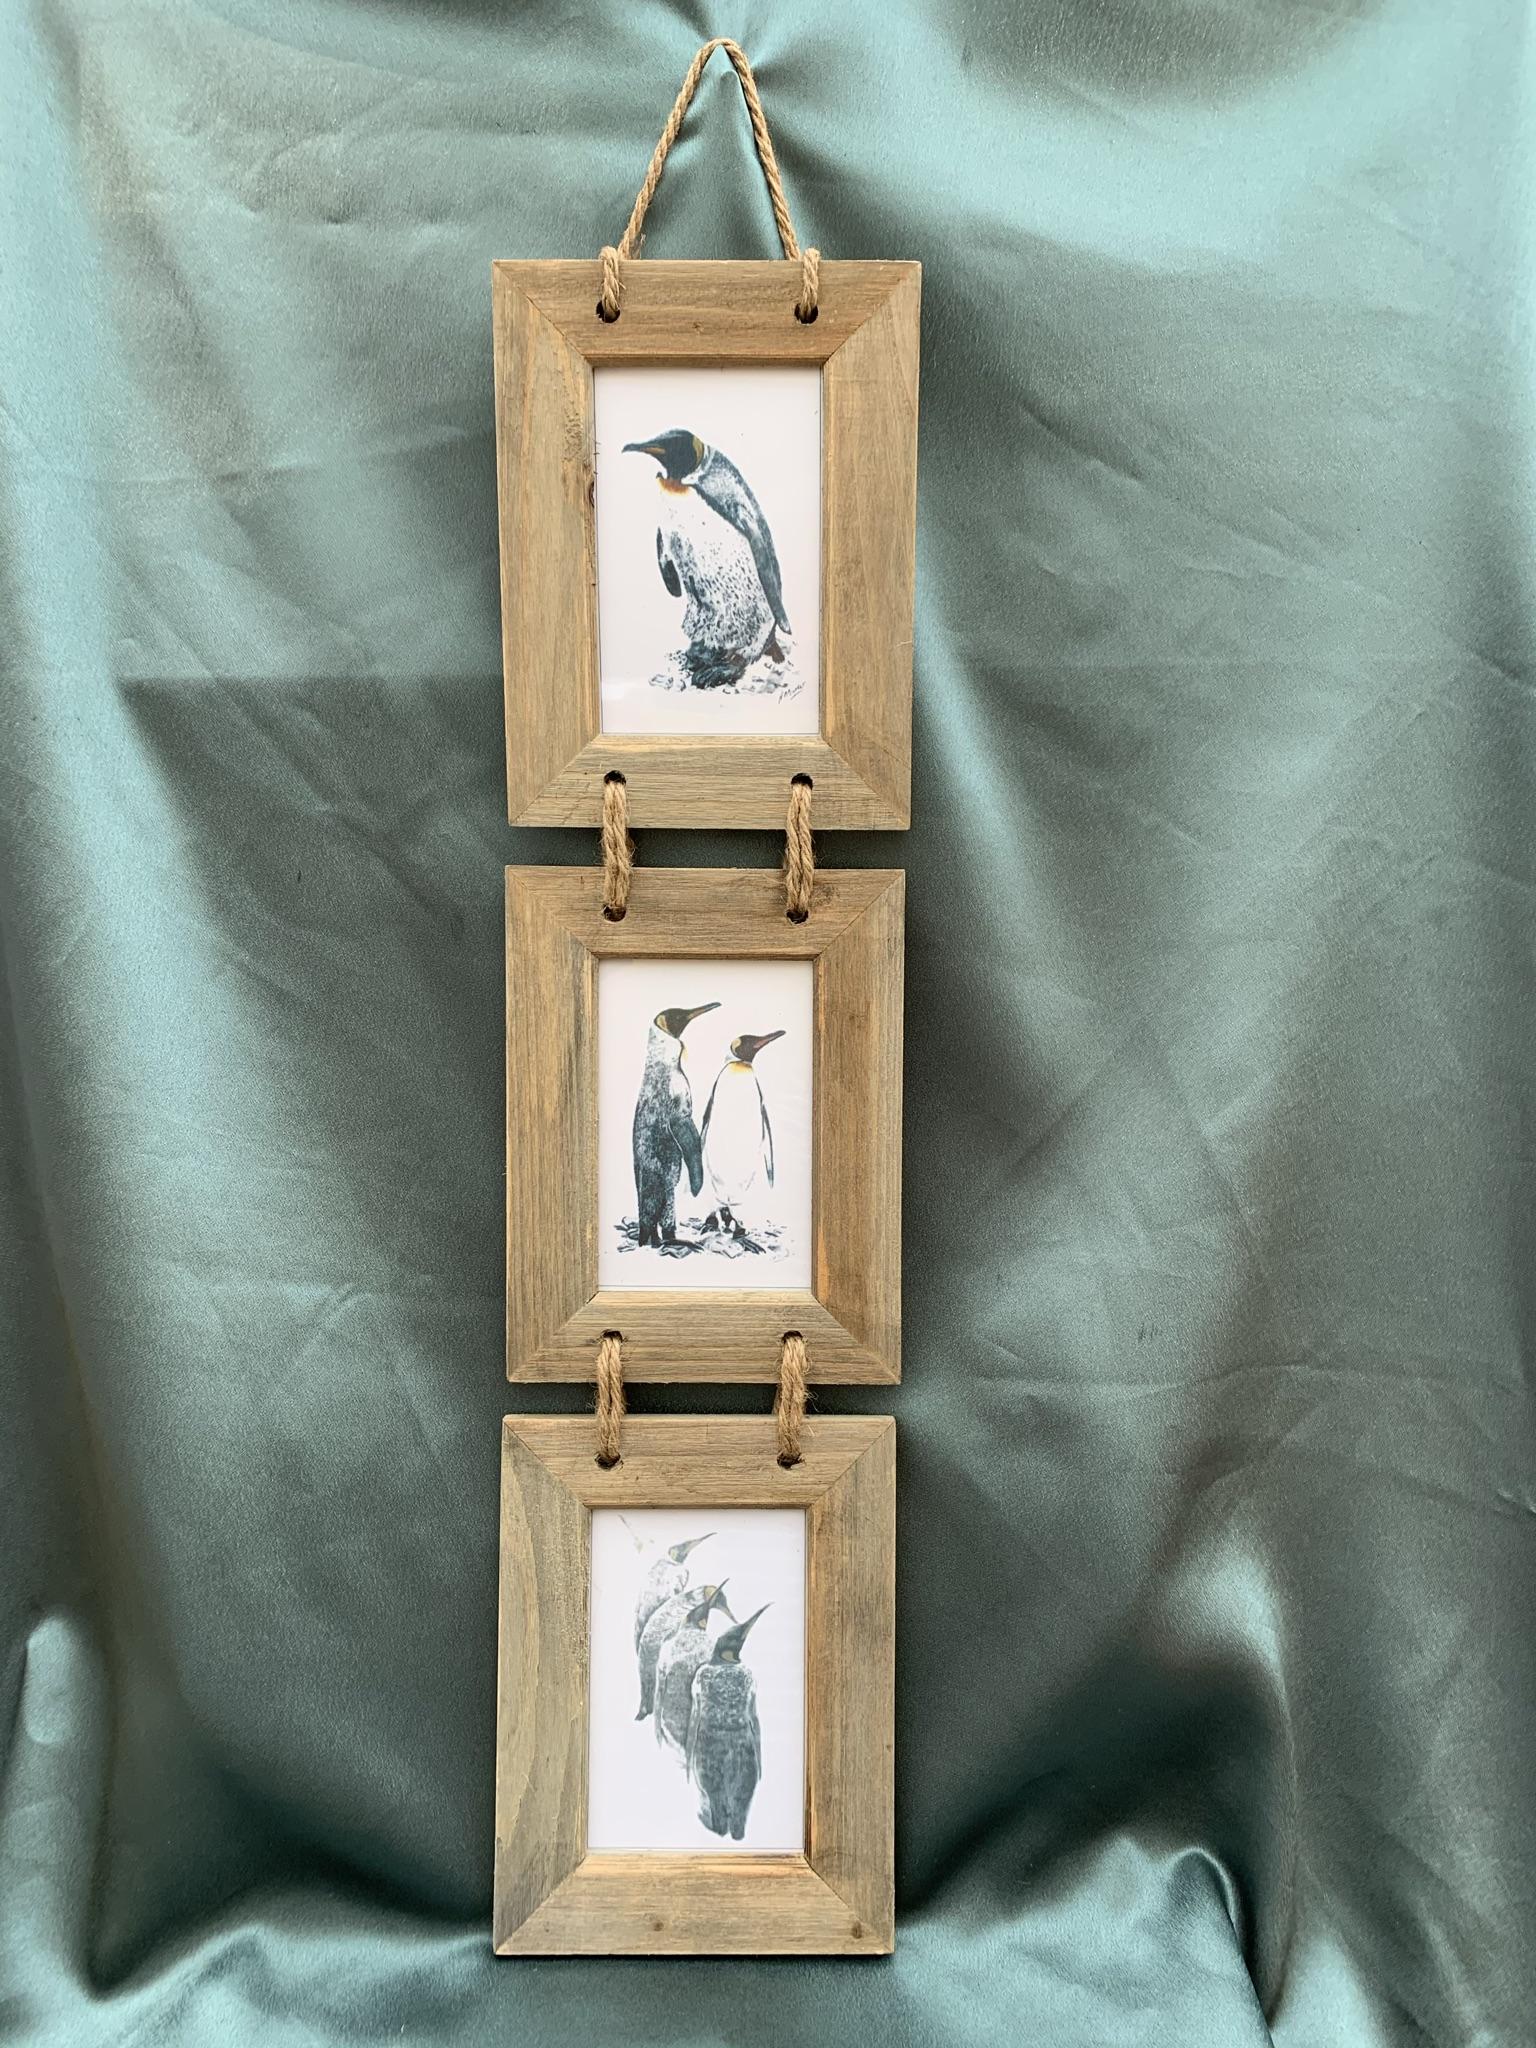 Trio of Penguin Pictures - Rustic Frame - £25